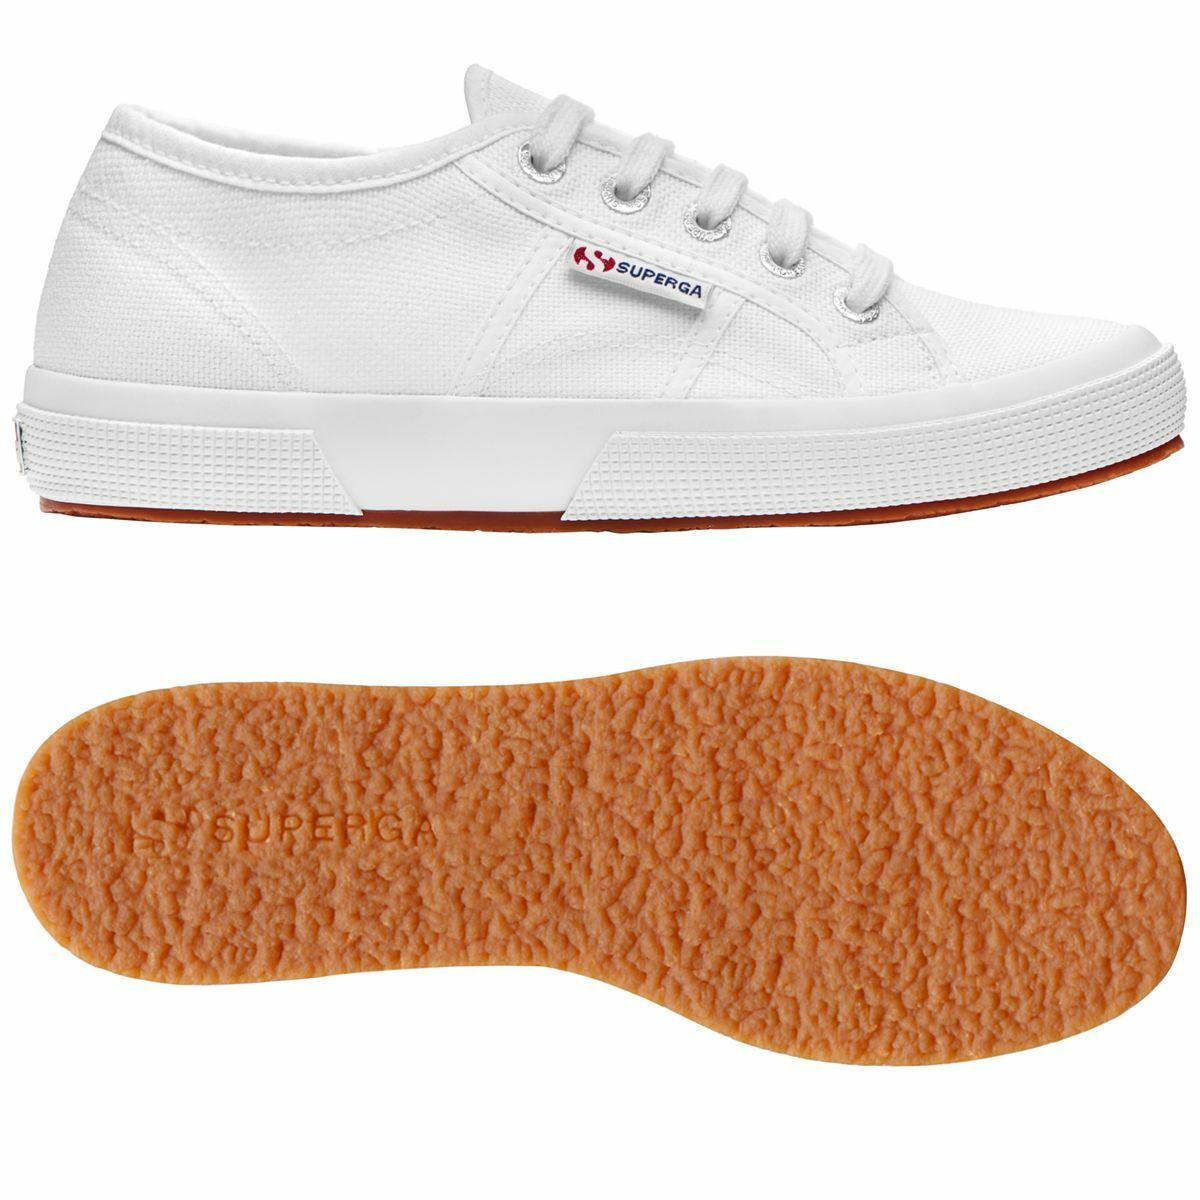 shoes Superga women women women - 2750 Plus Cotu Tela - Bianco - 2750P 57fa17